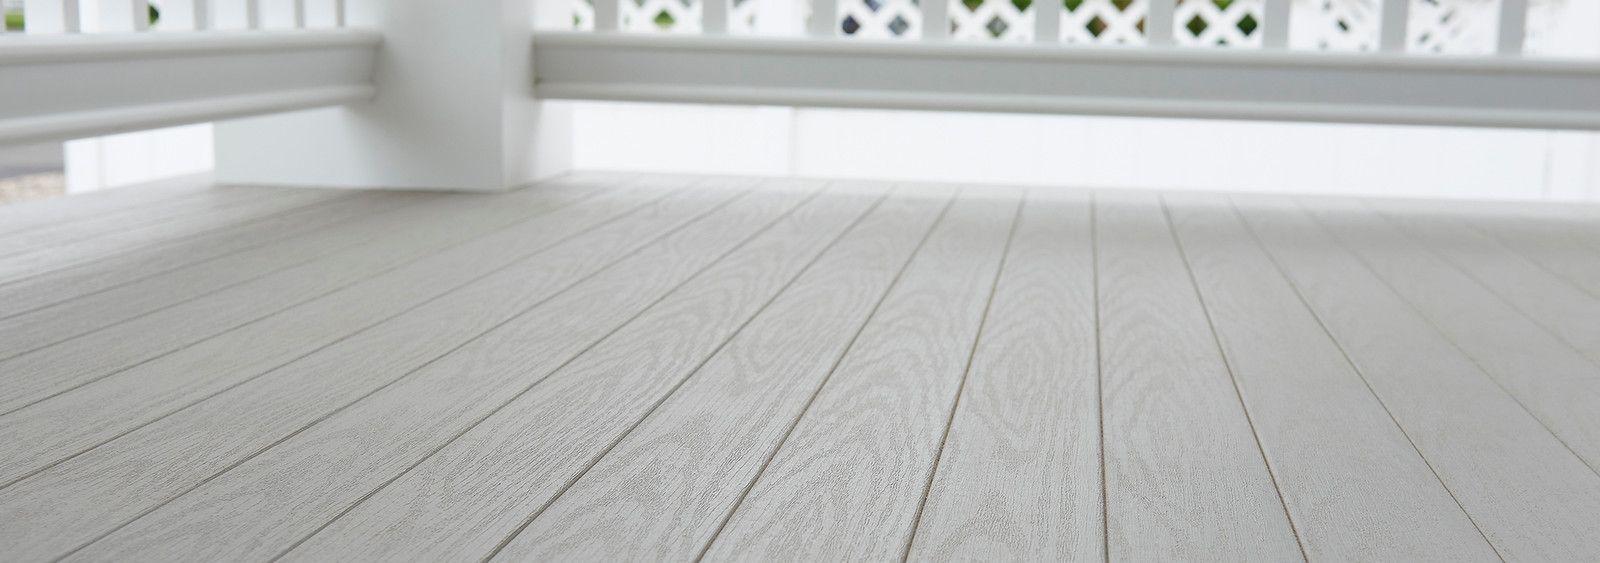 Wolf Pvc Porch Flooring Materials